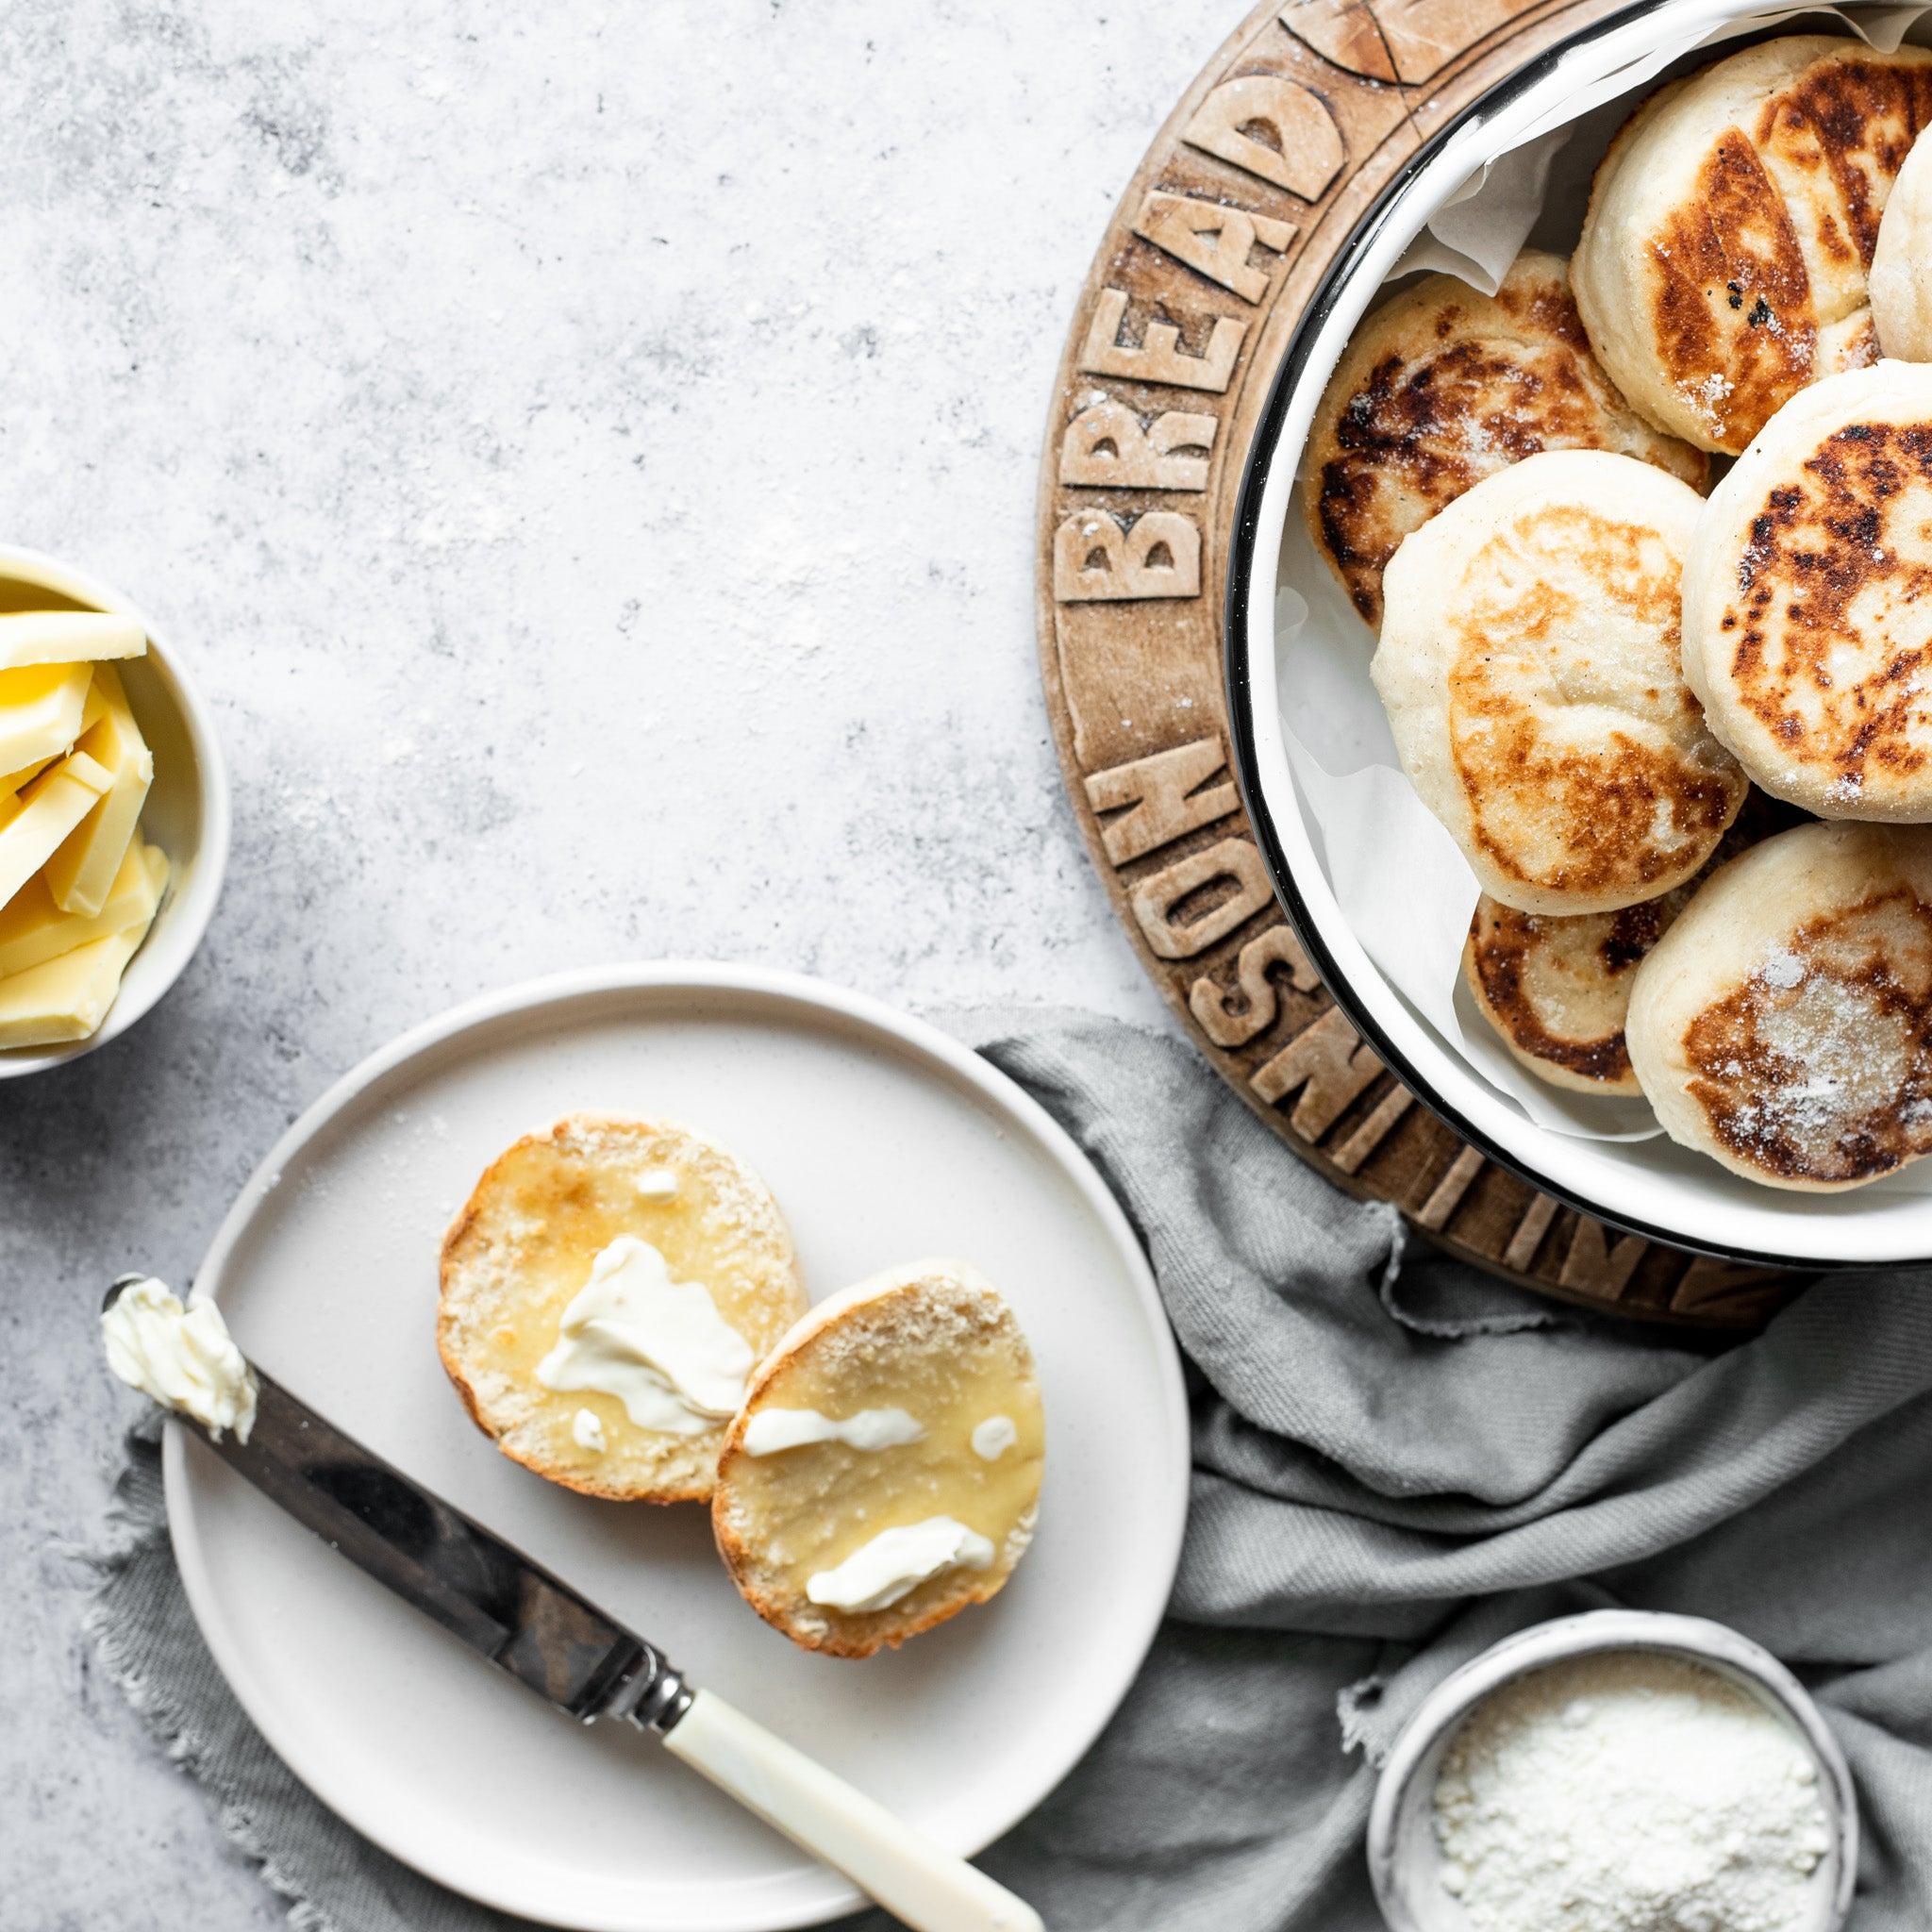 Allinsons-English-Muffins-1-1-Baking-Mad-3.jpg